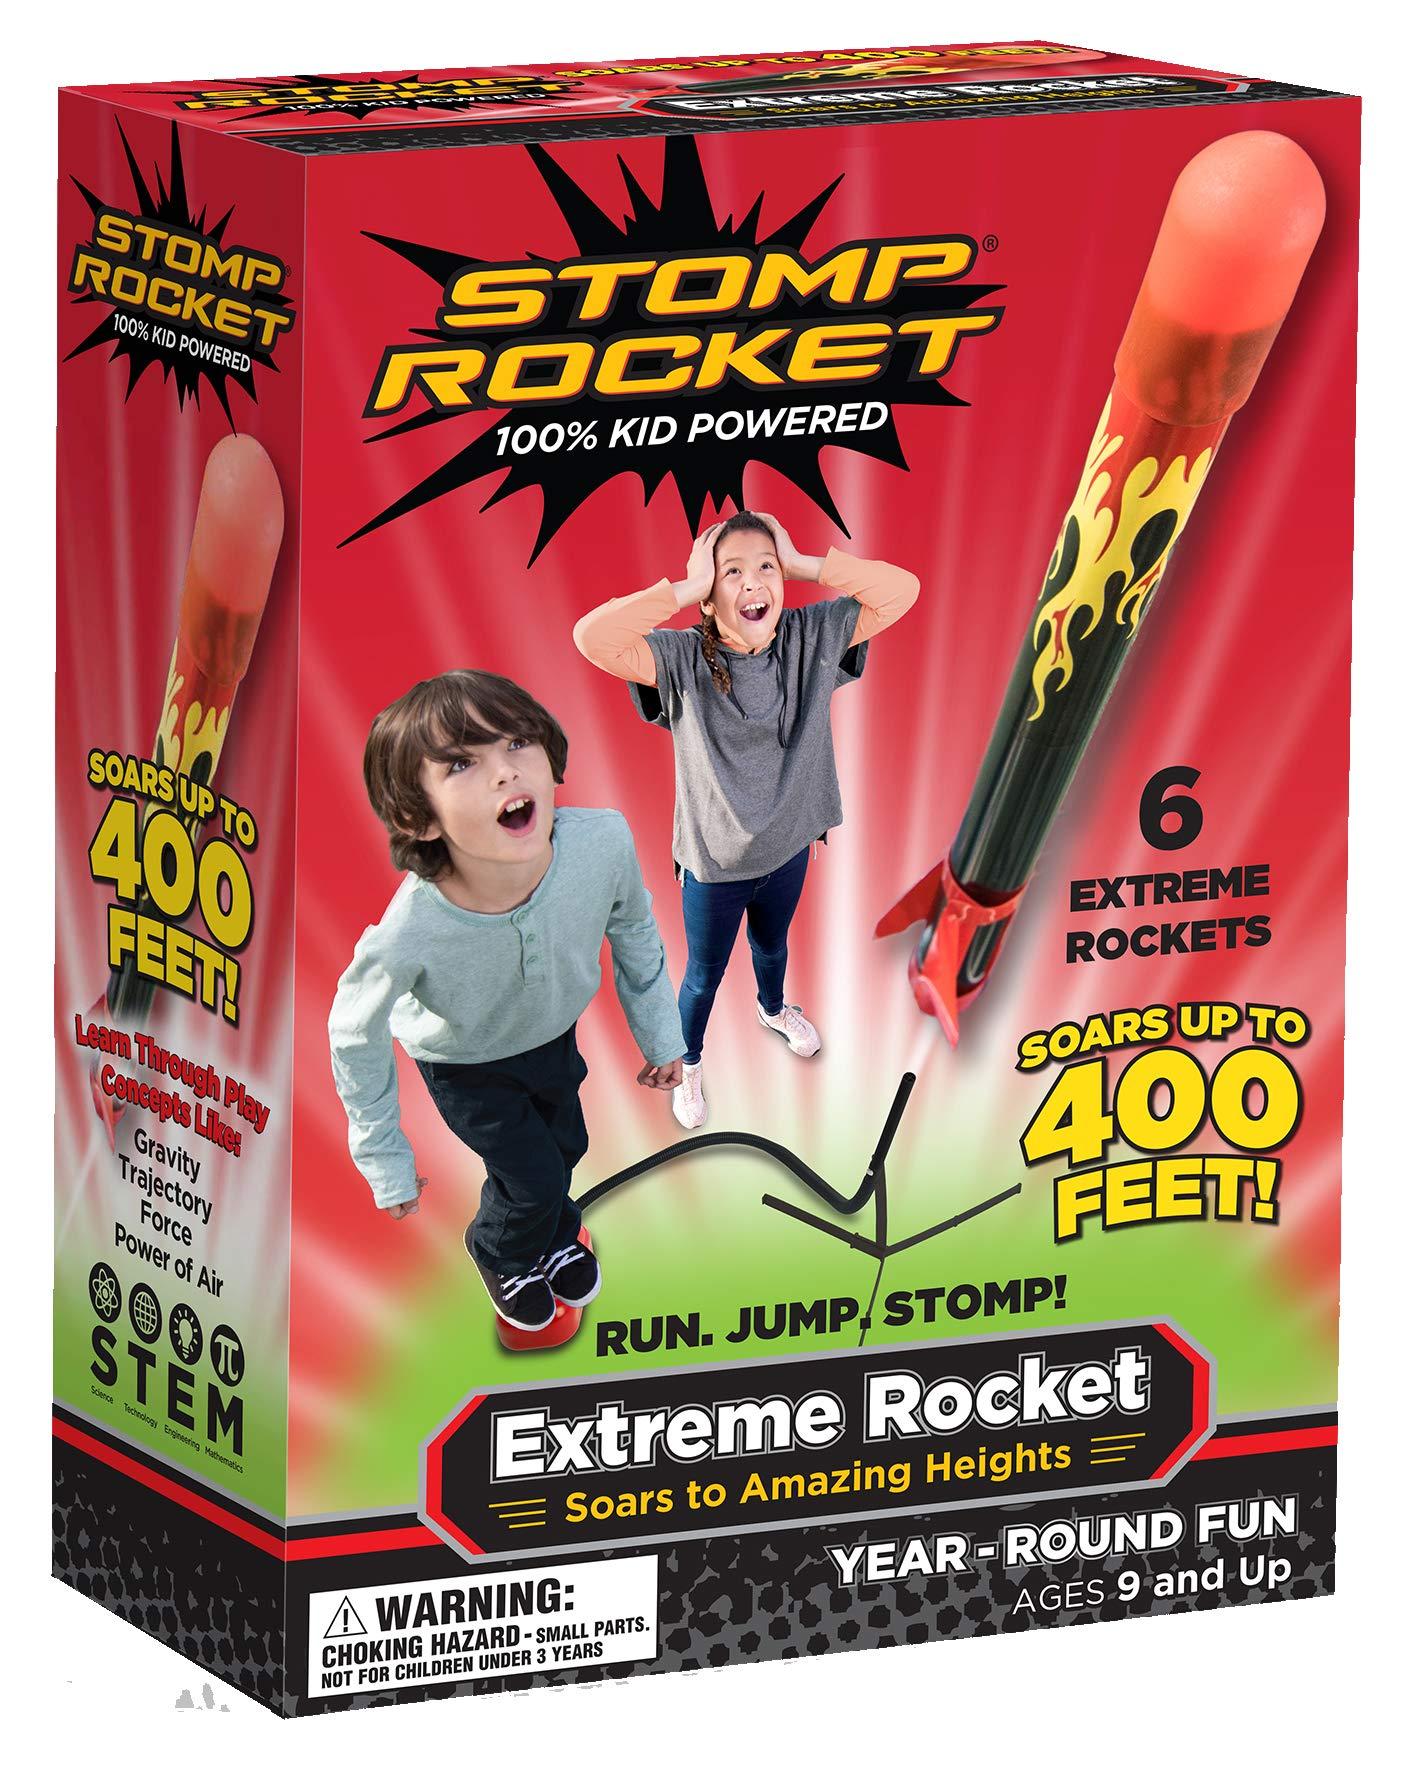 Stomp Rocket Extreme Rocket (Super High Performance), 6 Rockets